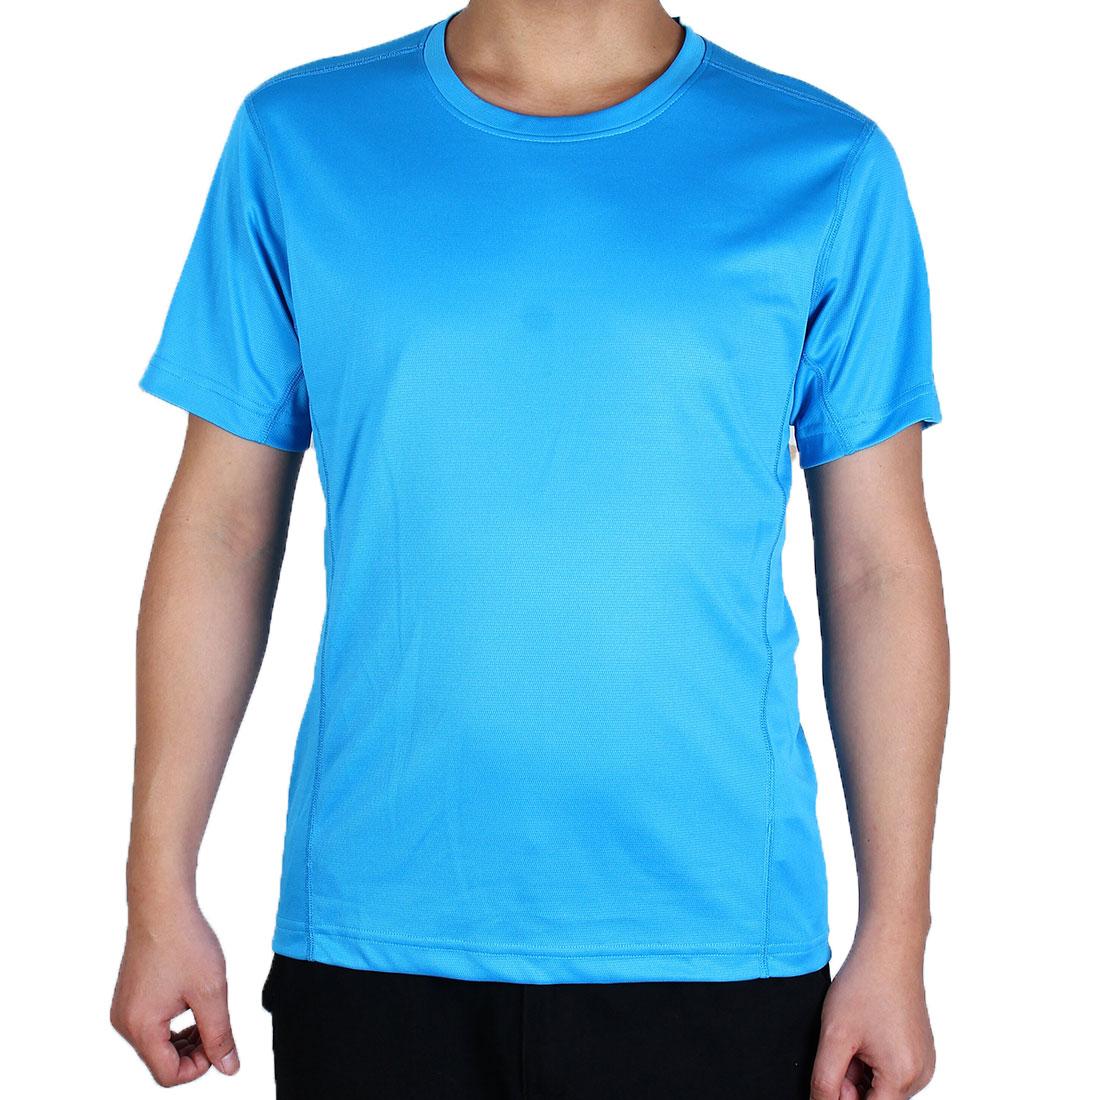 Men Short Sleeve Clothes Casual Wear Tee Cycling Biking Sports T-shirt Blue L